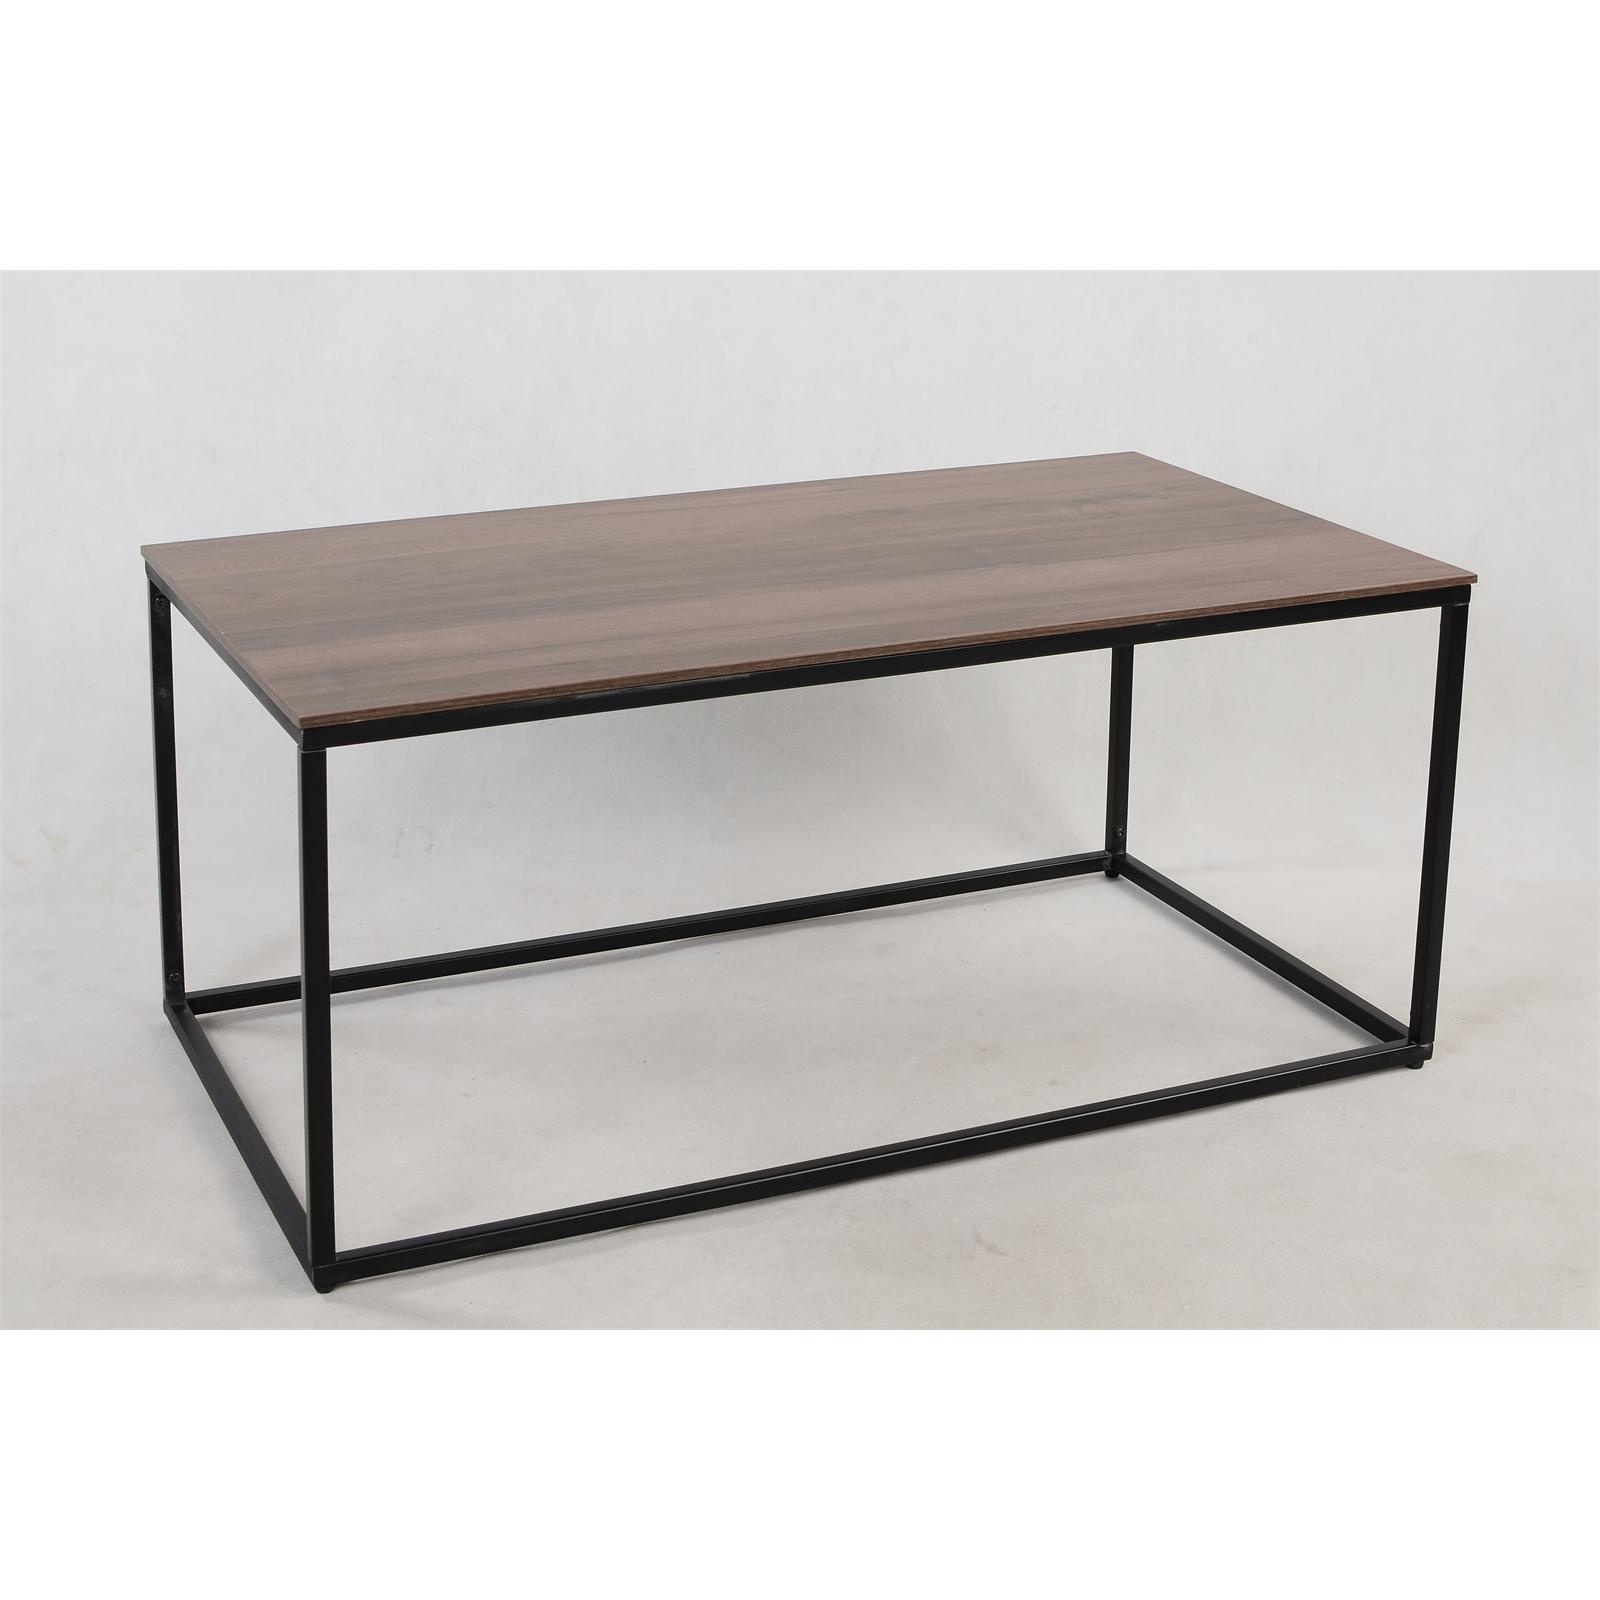 Coffee Table with  walnut top and a matt black minimal metal frame £24.50 @ Homebase c&c